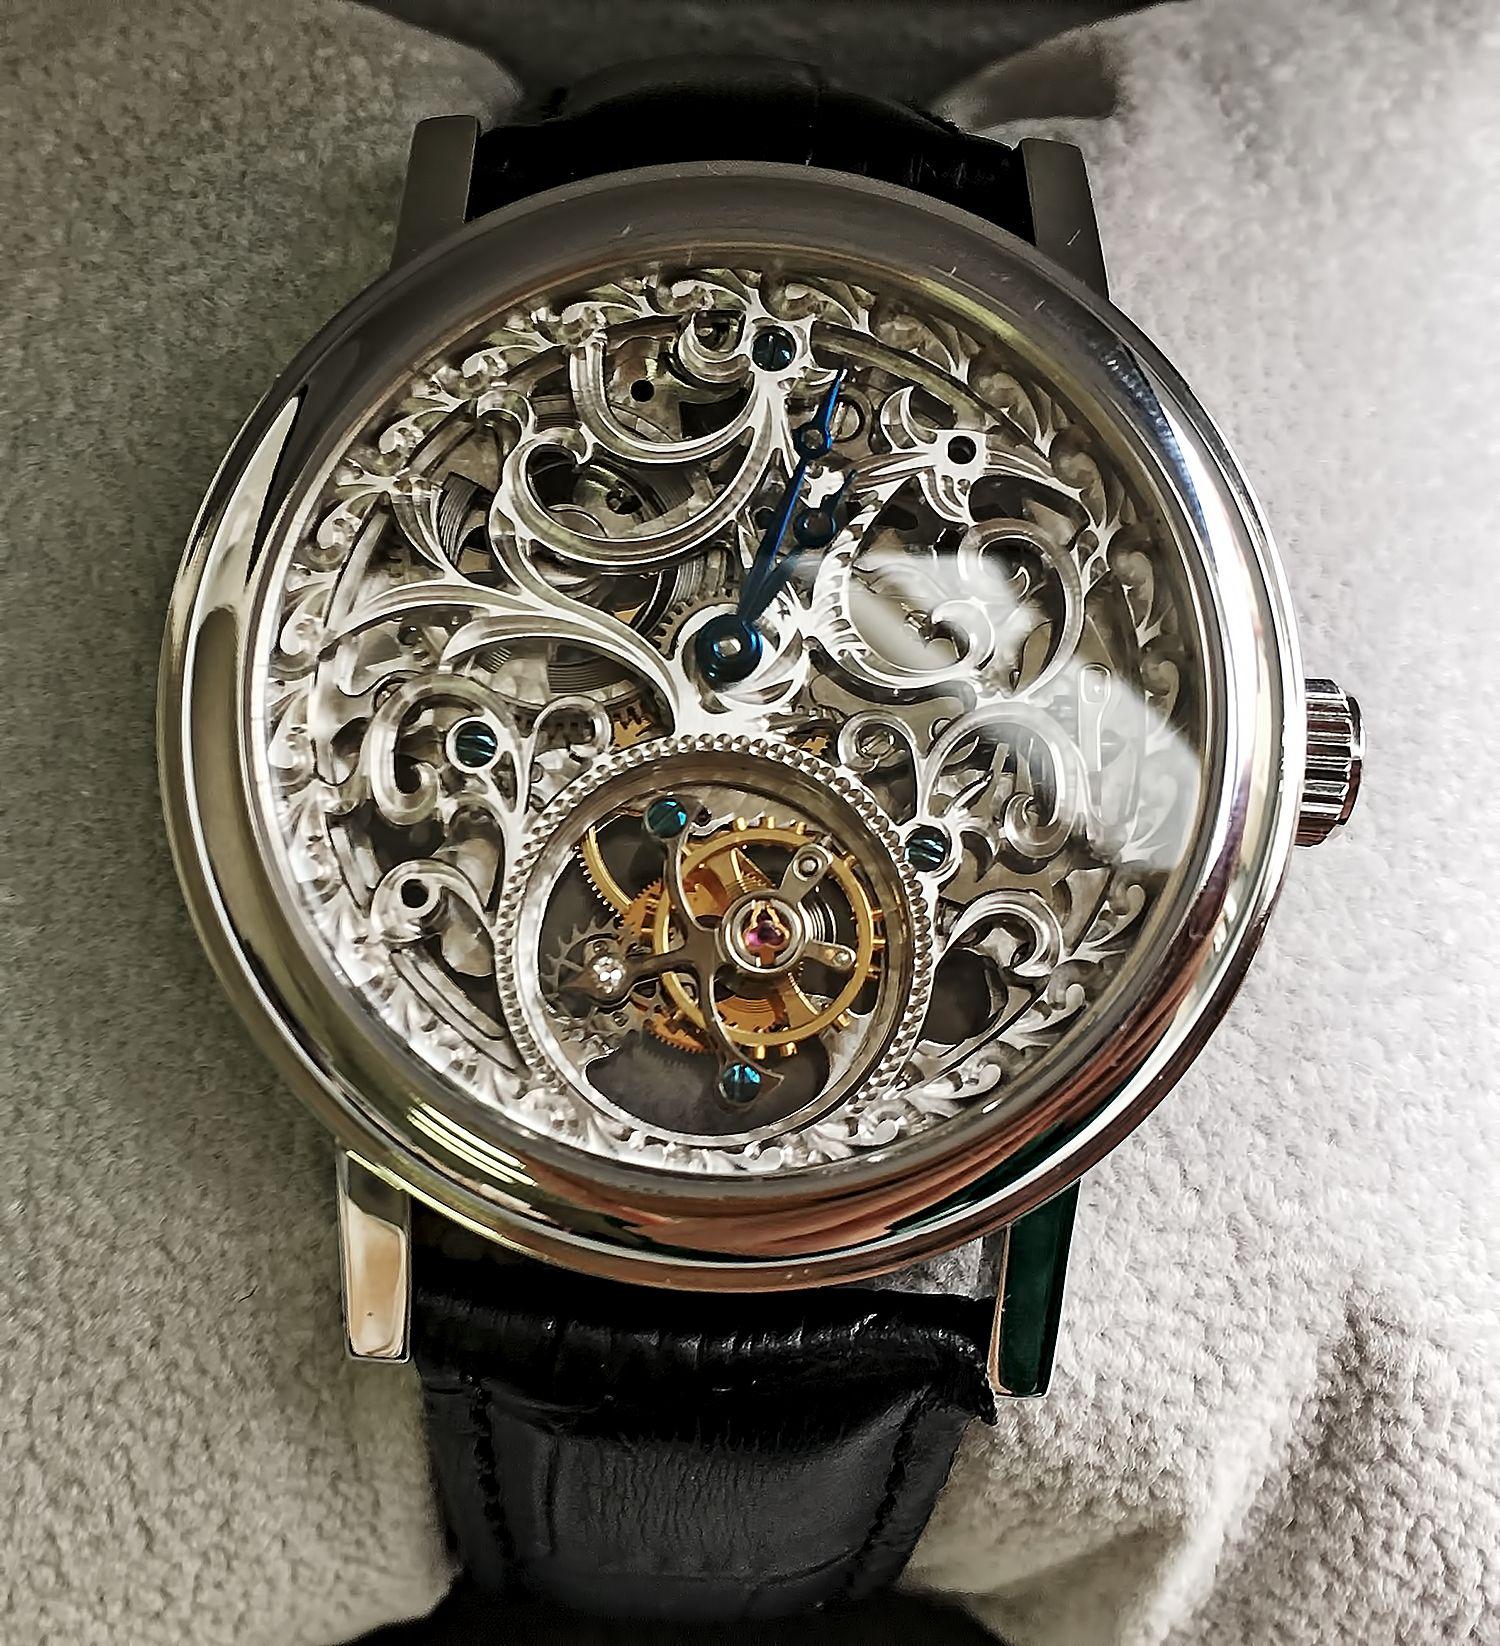 Хронометр Breguet Classique Skeleton Tourbillon Steel Watch